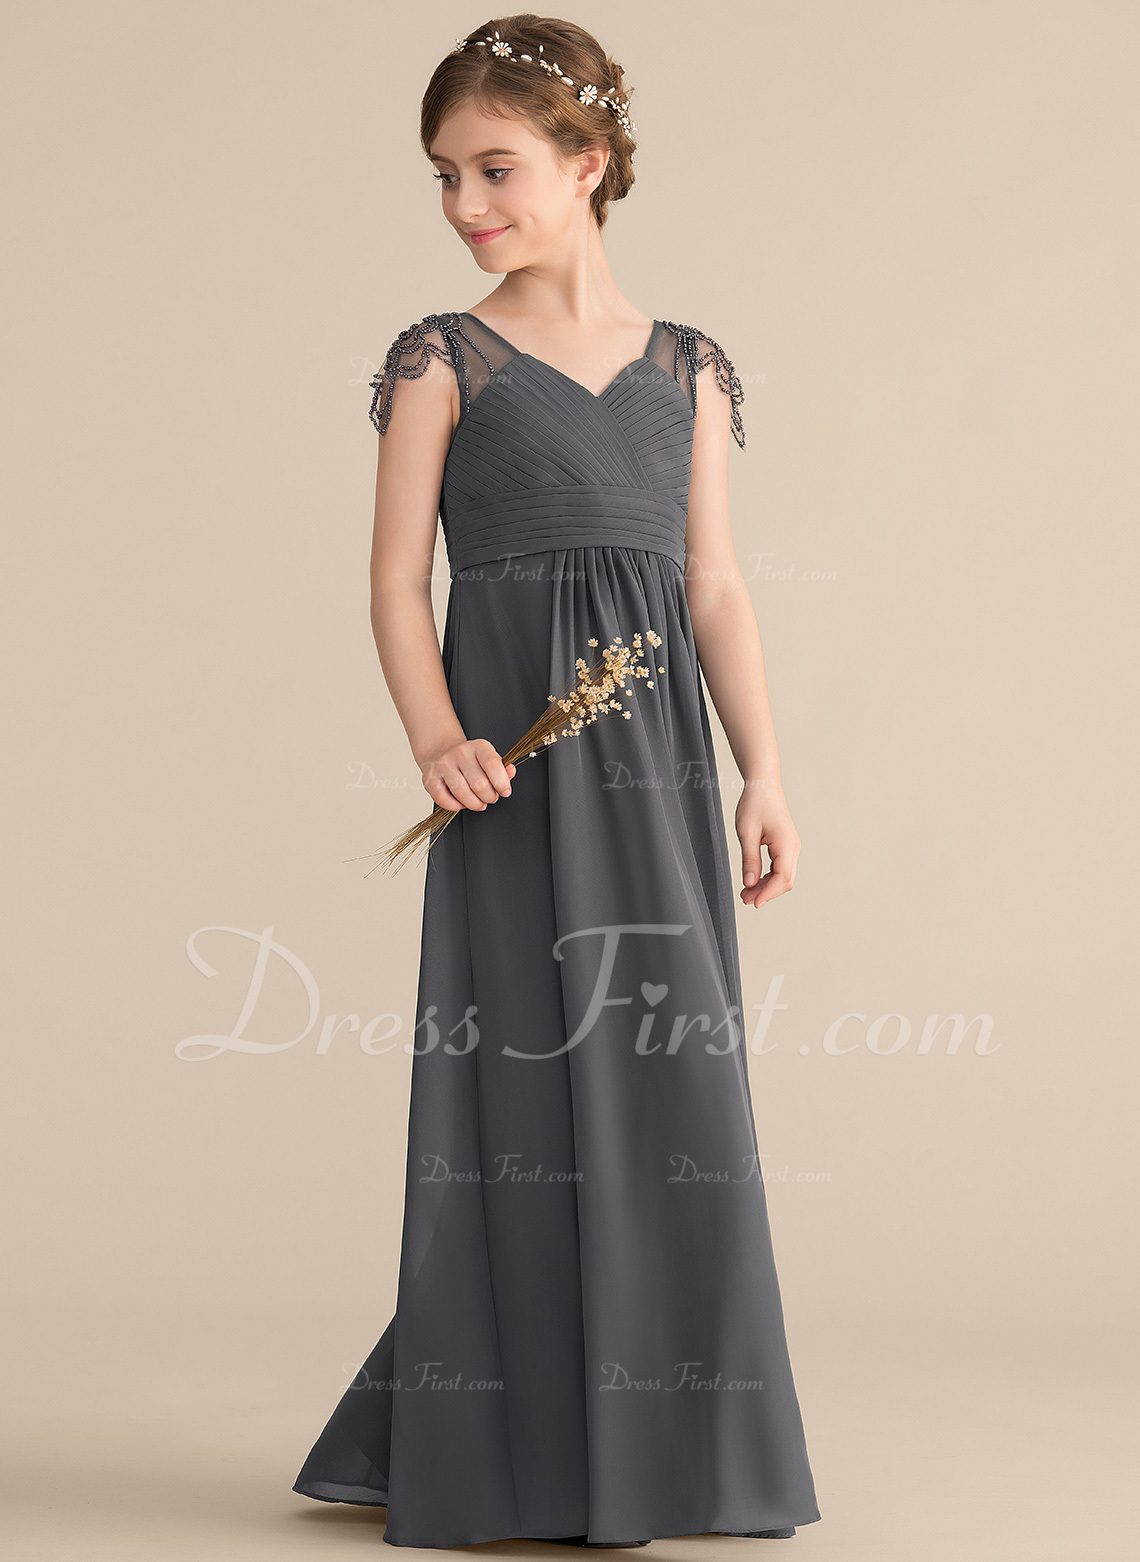 A-Line/Princess V-neck Floor-Length Chiffon Junior Bridesmaid Dress With Ruffle Beading